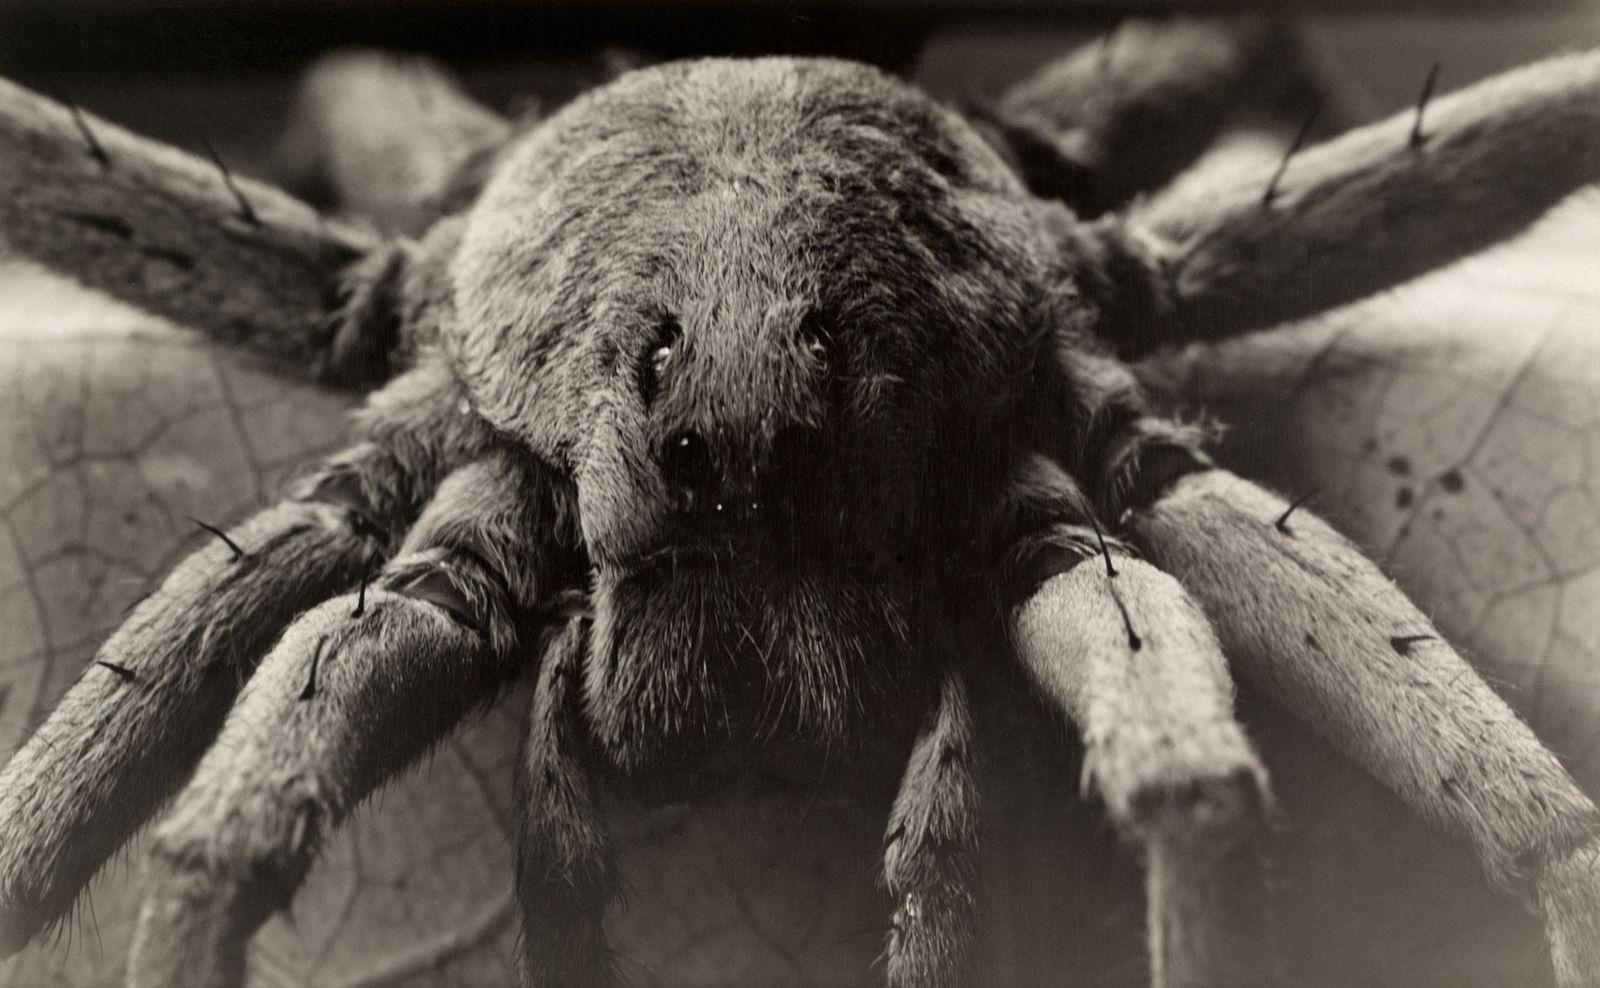 See vintage photos of creepy crawlies